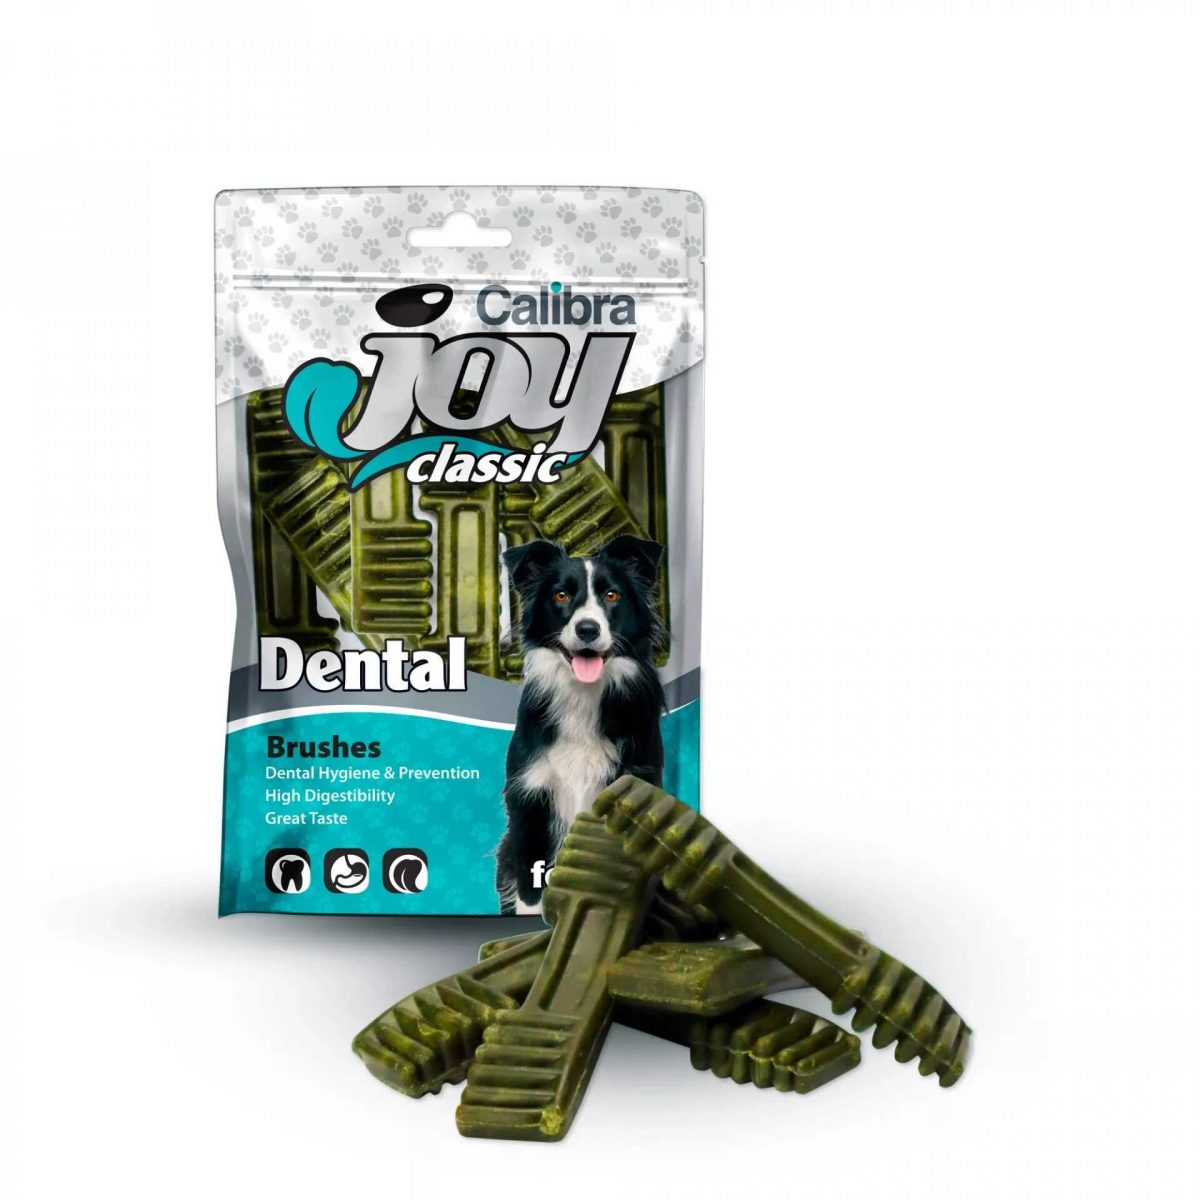 894 calibra dog joy dental brusches